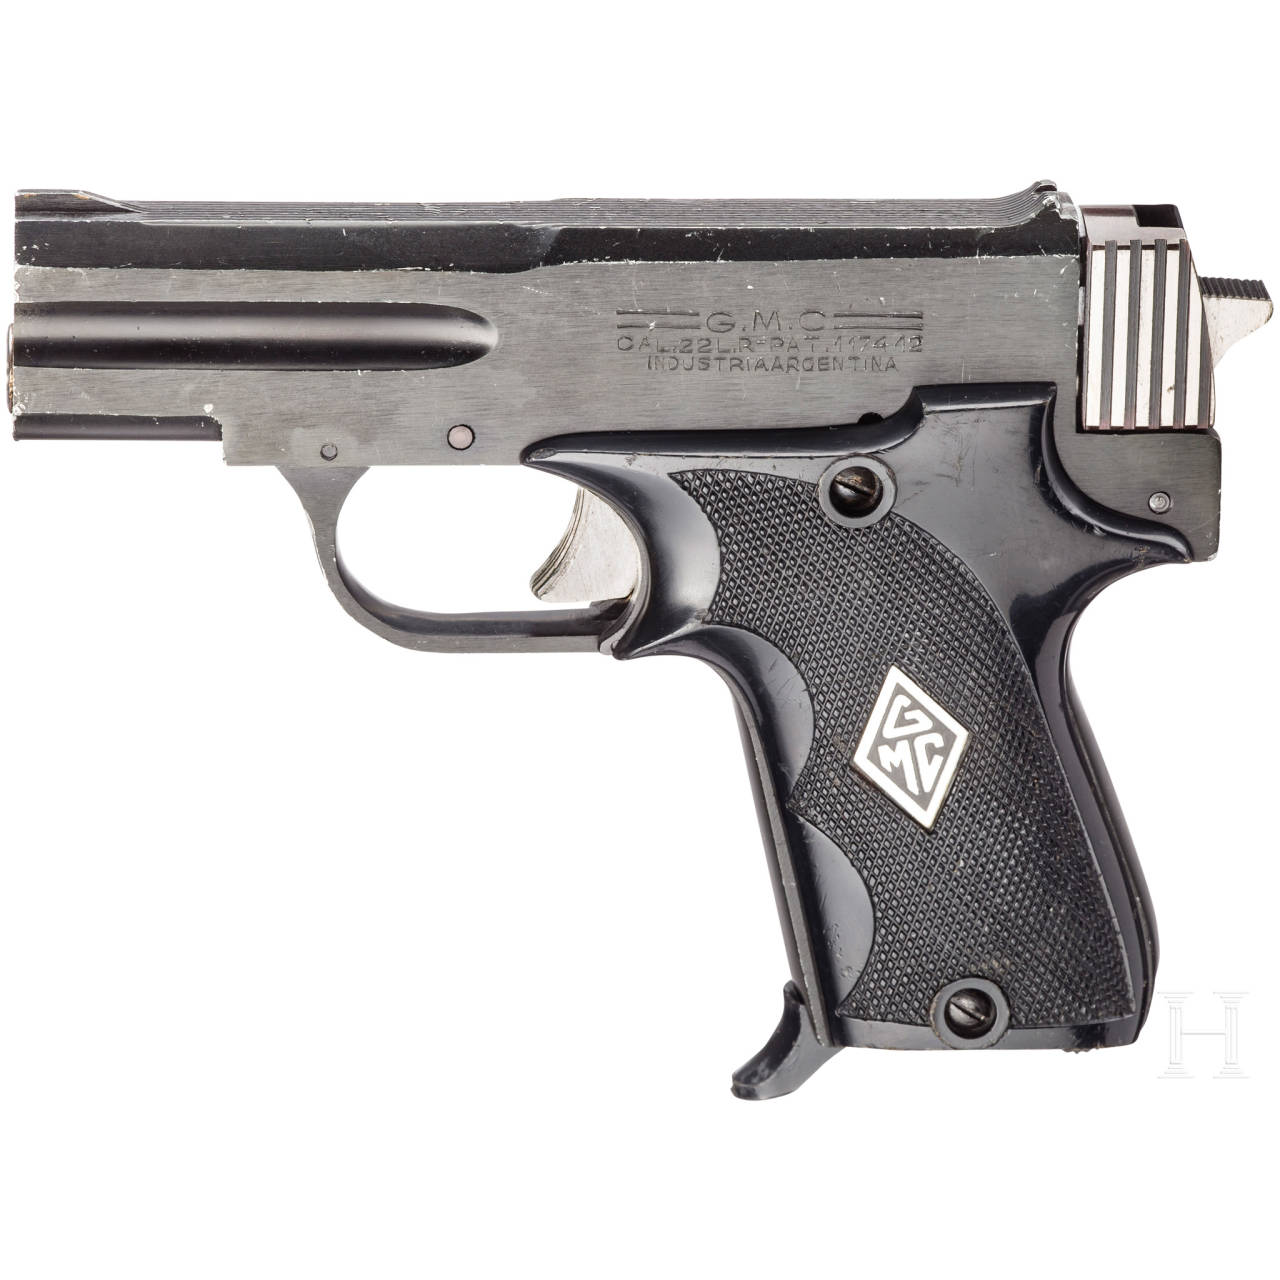 Pistole G.M.C.